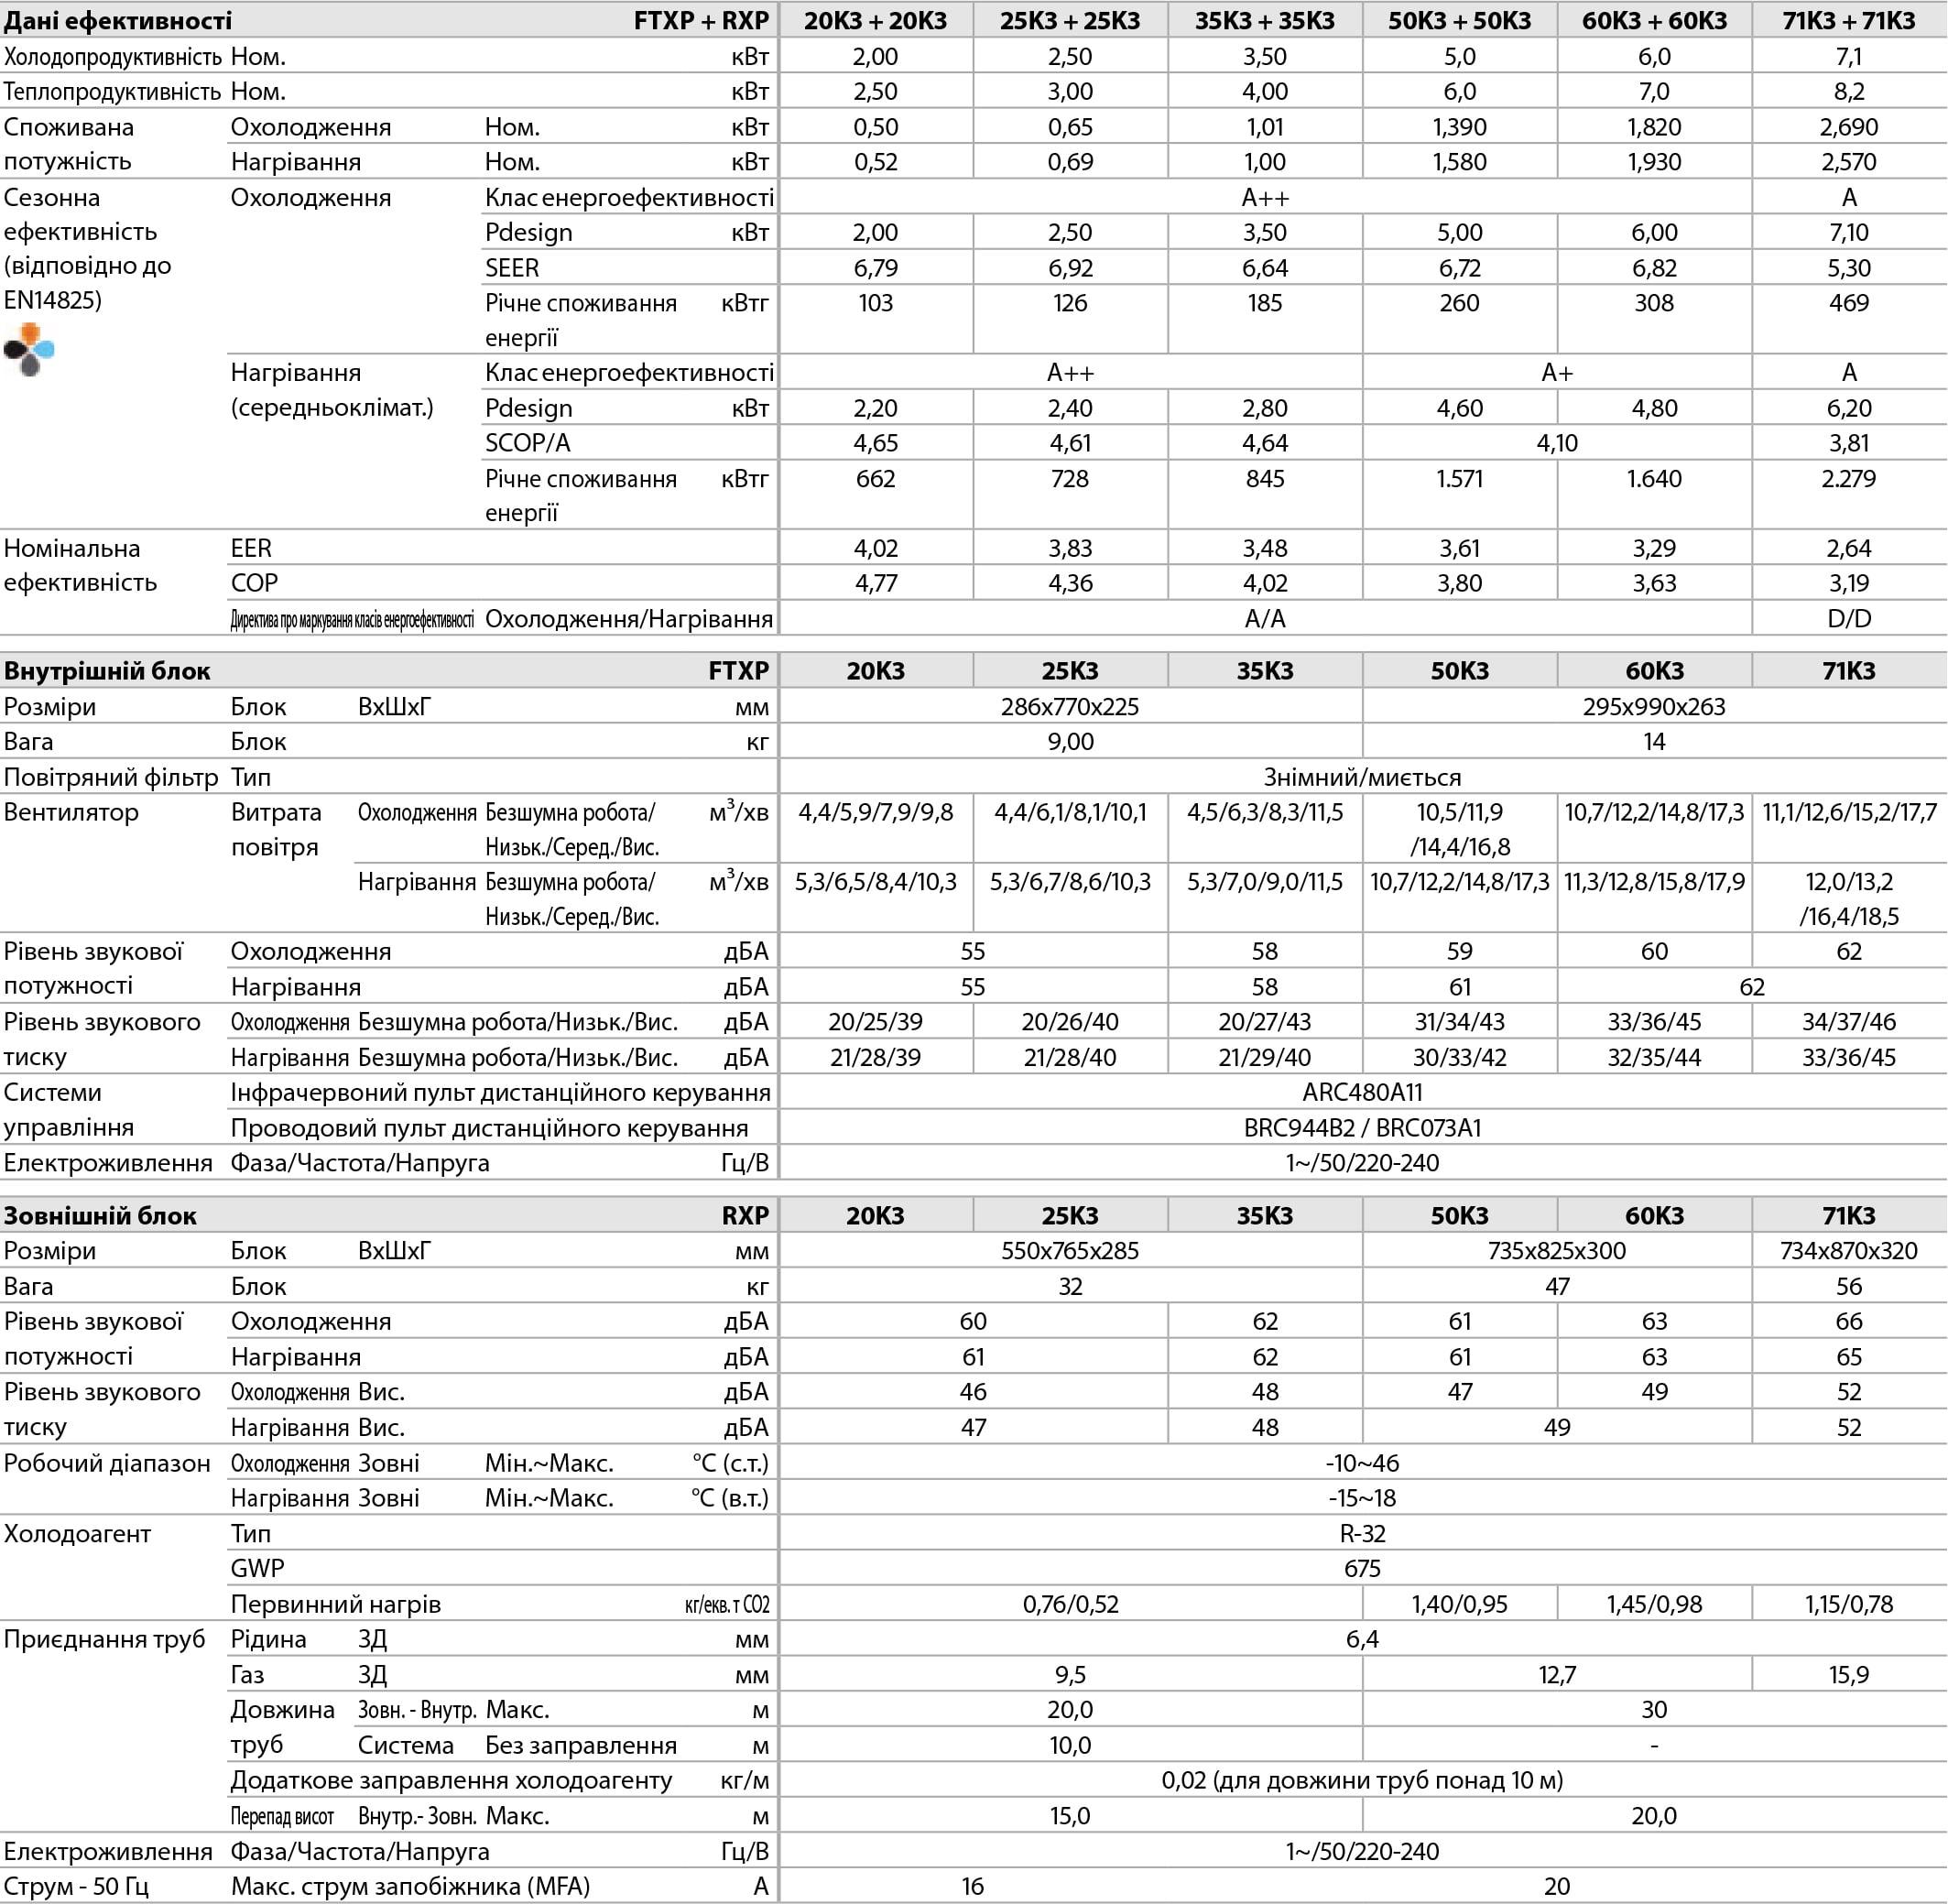 Технические характеристики кондиционера Daikin FTXP-K3 серии Comfora FTXP Inverter